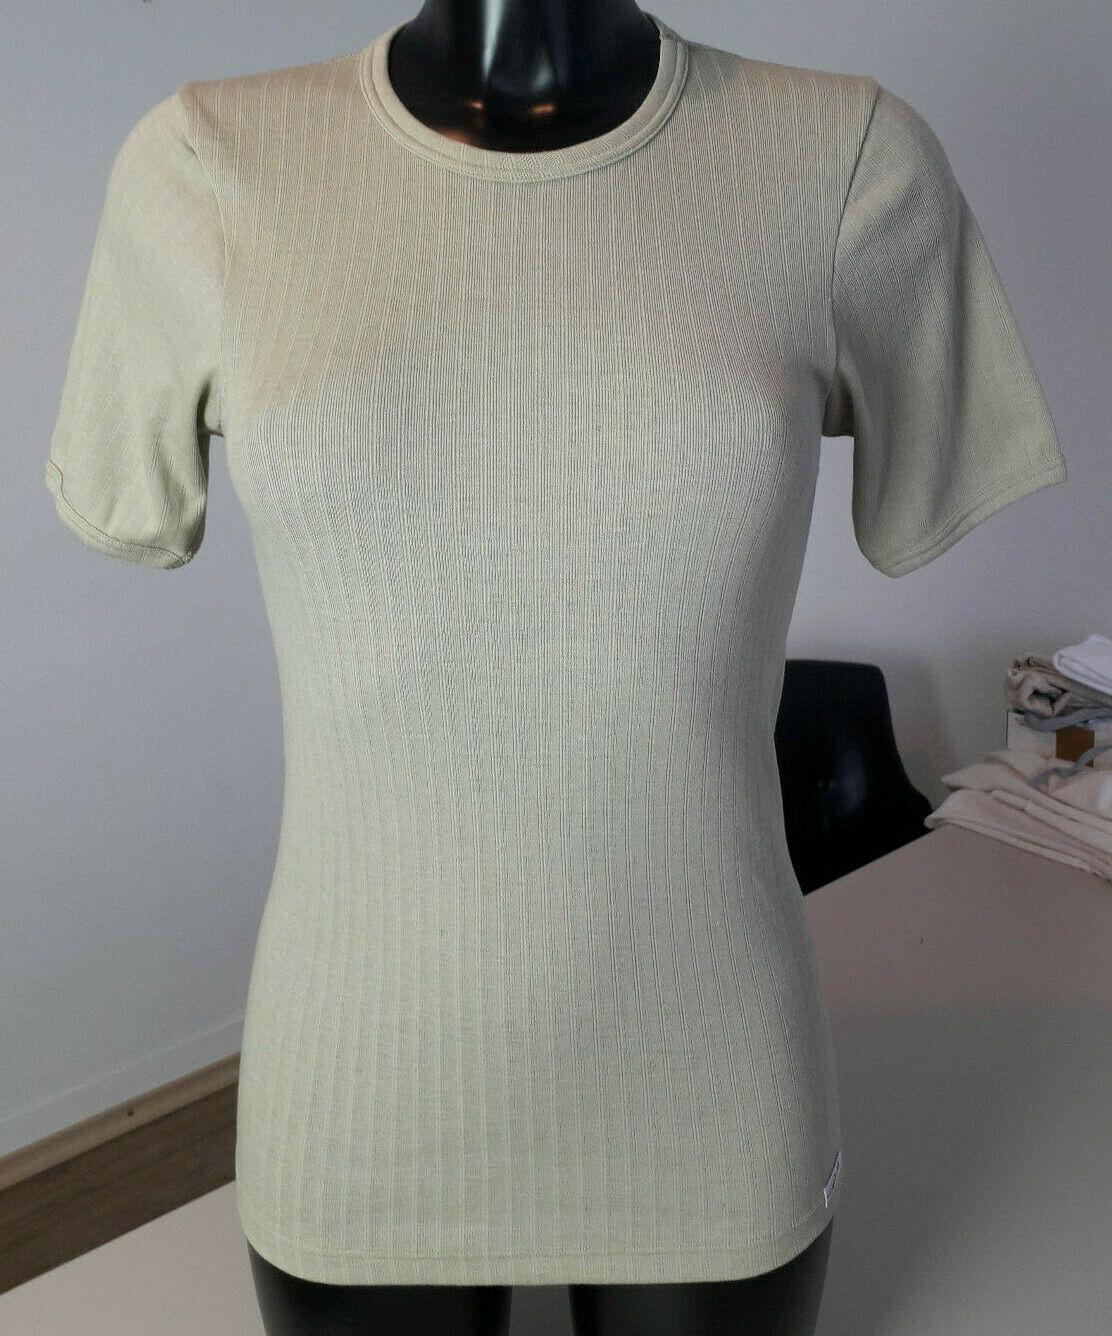 1b Ware - Unisex Kurzarm Unterhemd 67% Merinowolle | 33% Seide